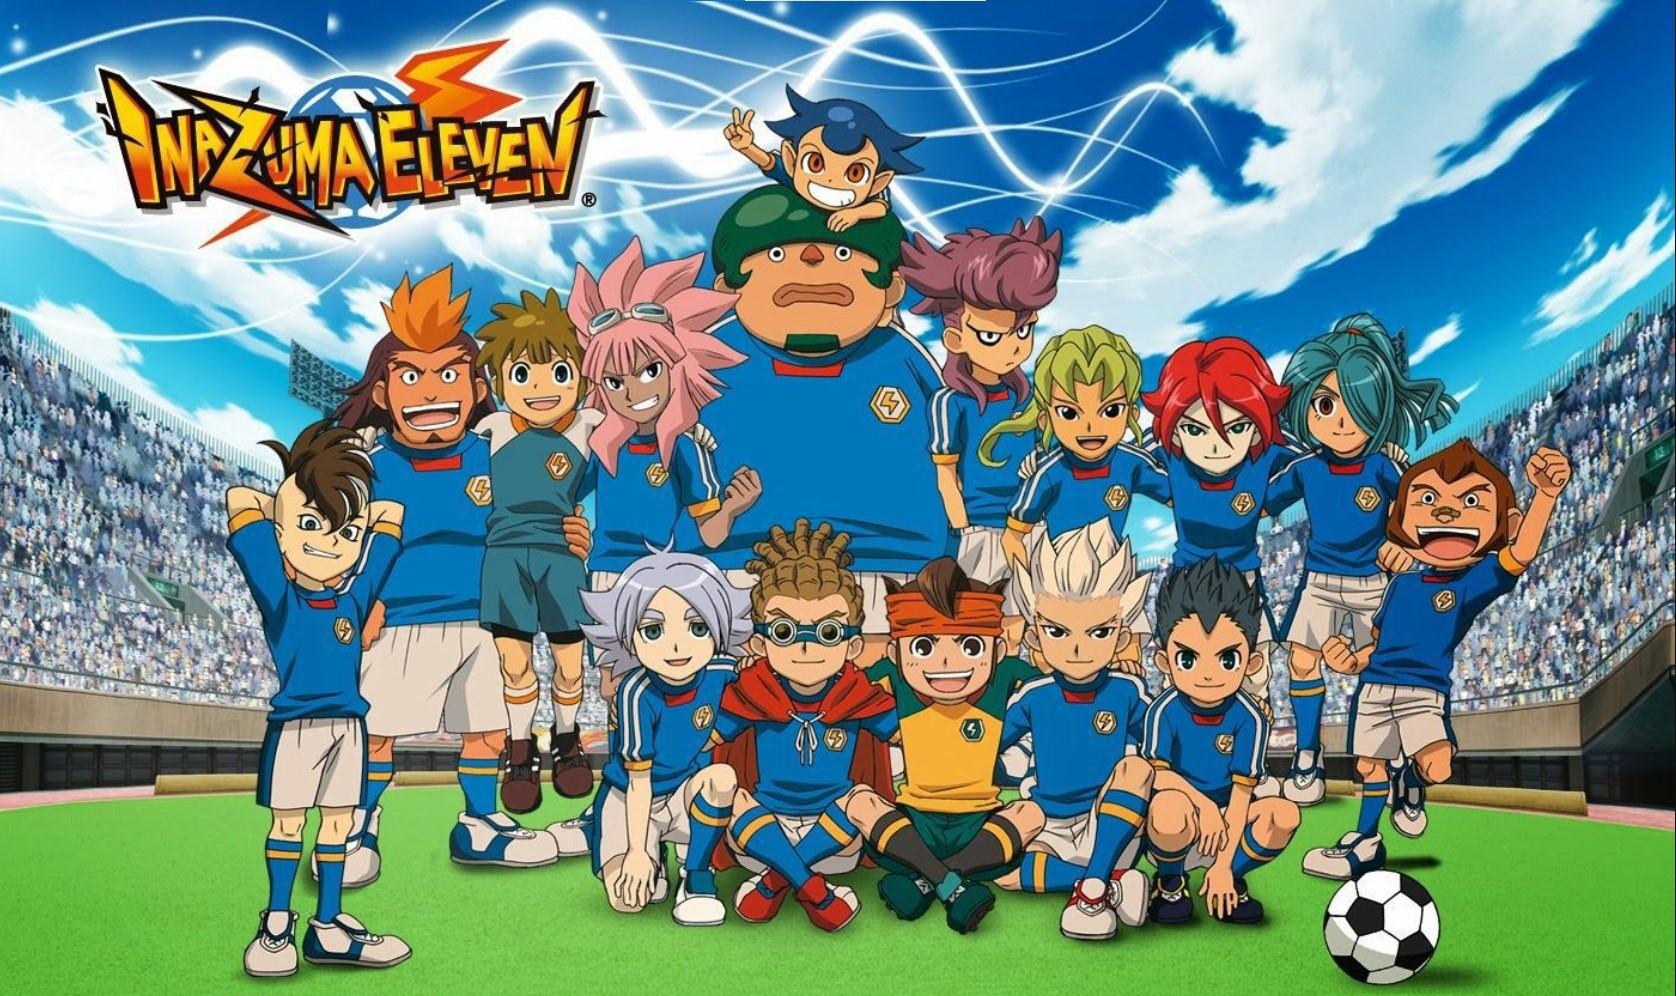 Inazuma Eleven- best football anime